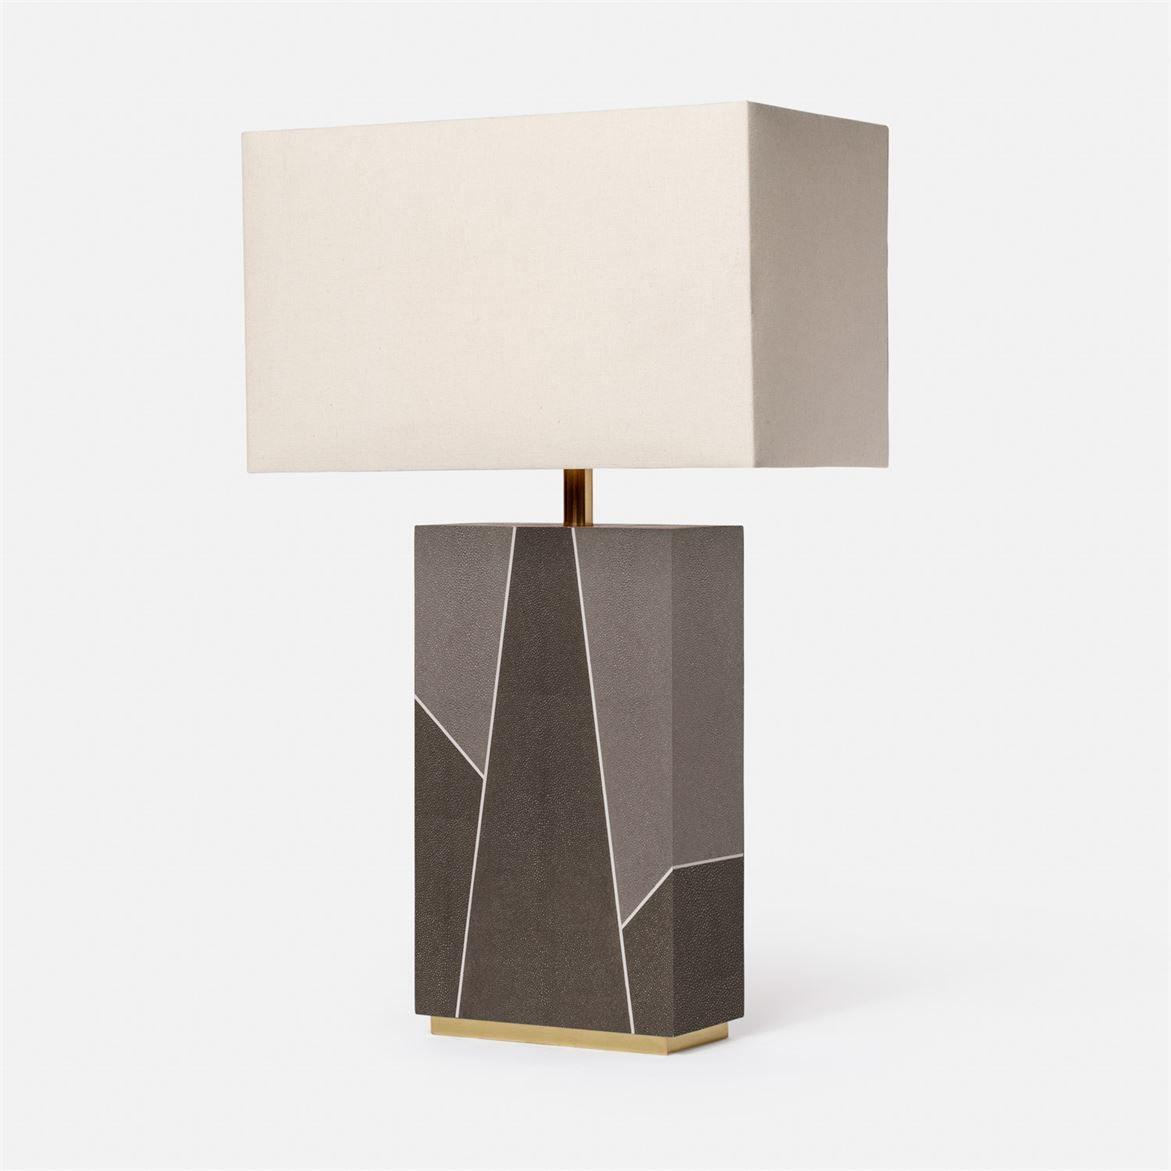 Lghbreckfsmxmh 2 Jpg Lamp Table Lamp Desk Lamp